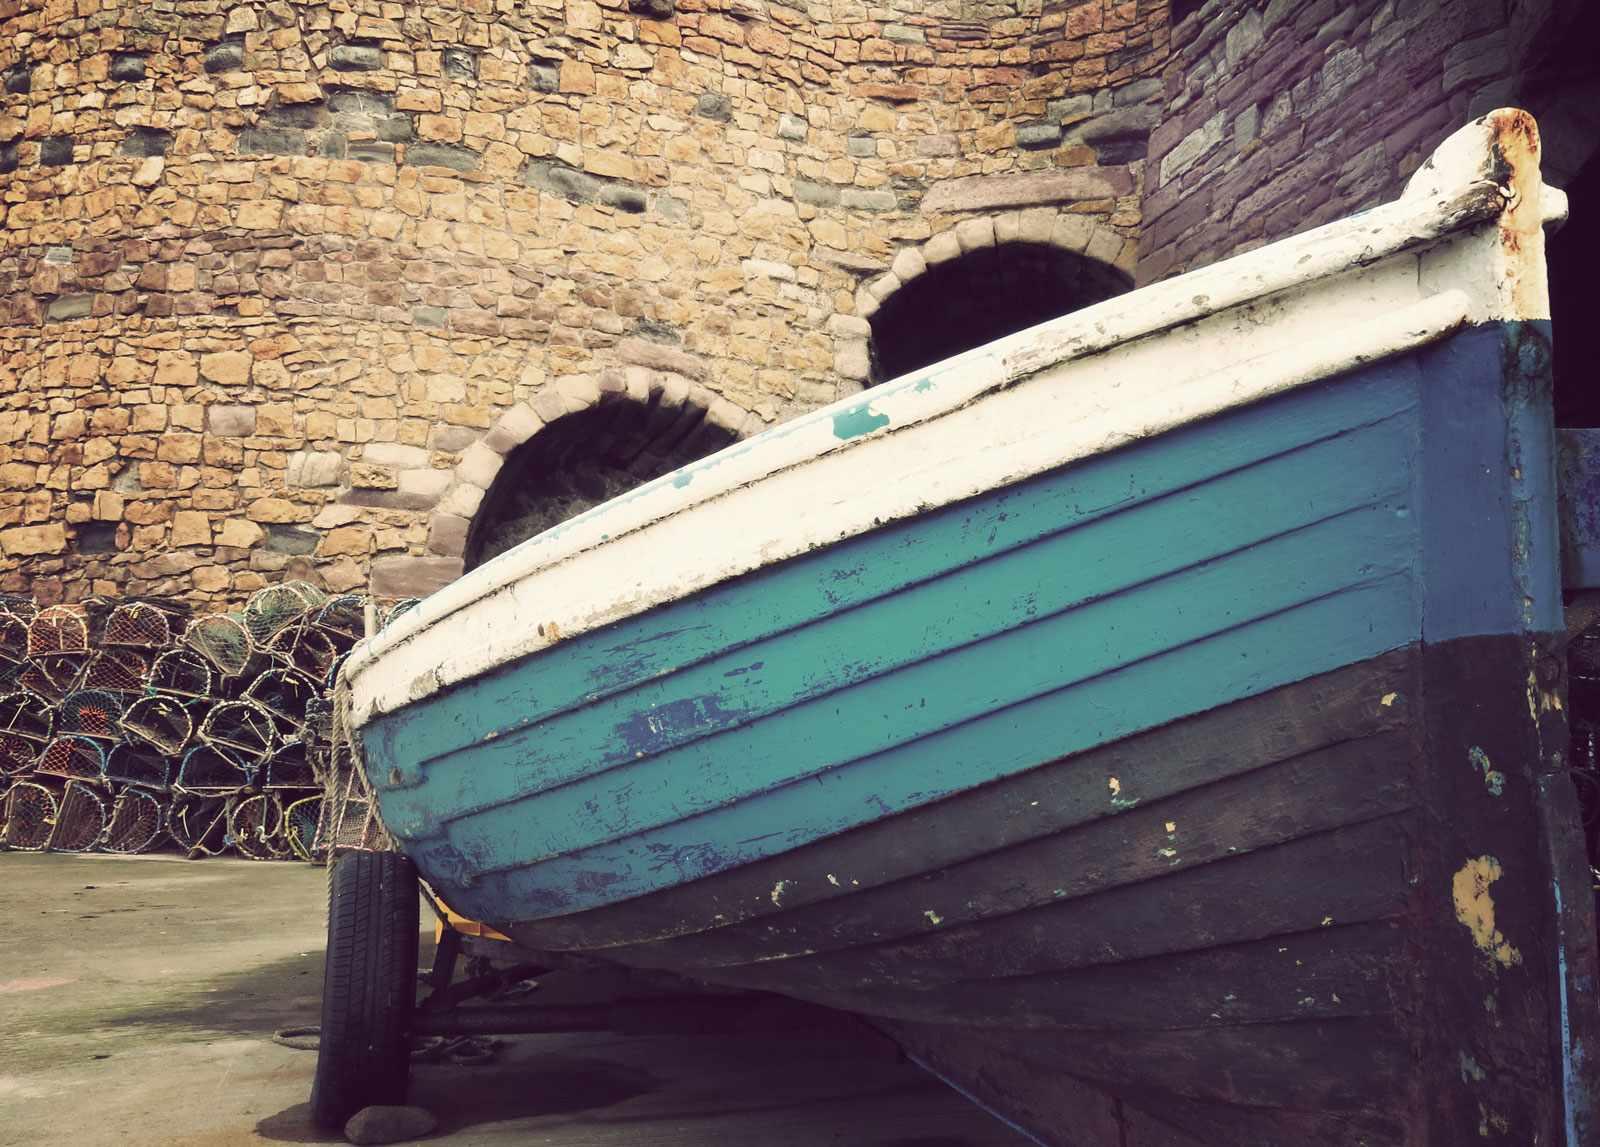 coble-boat-82fe2f0